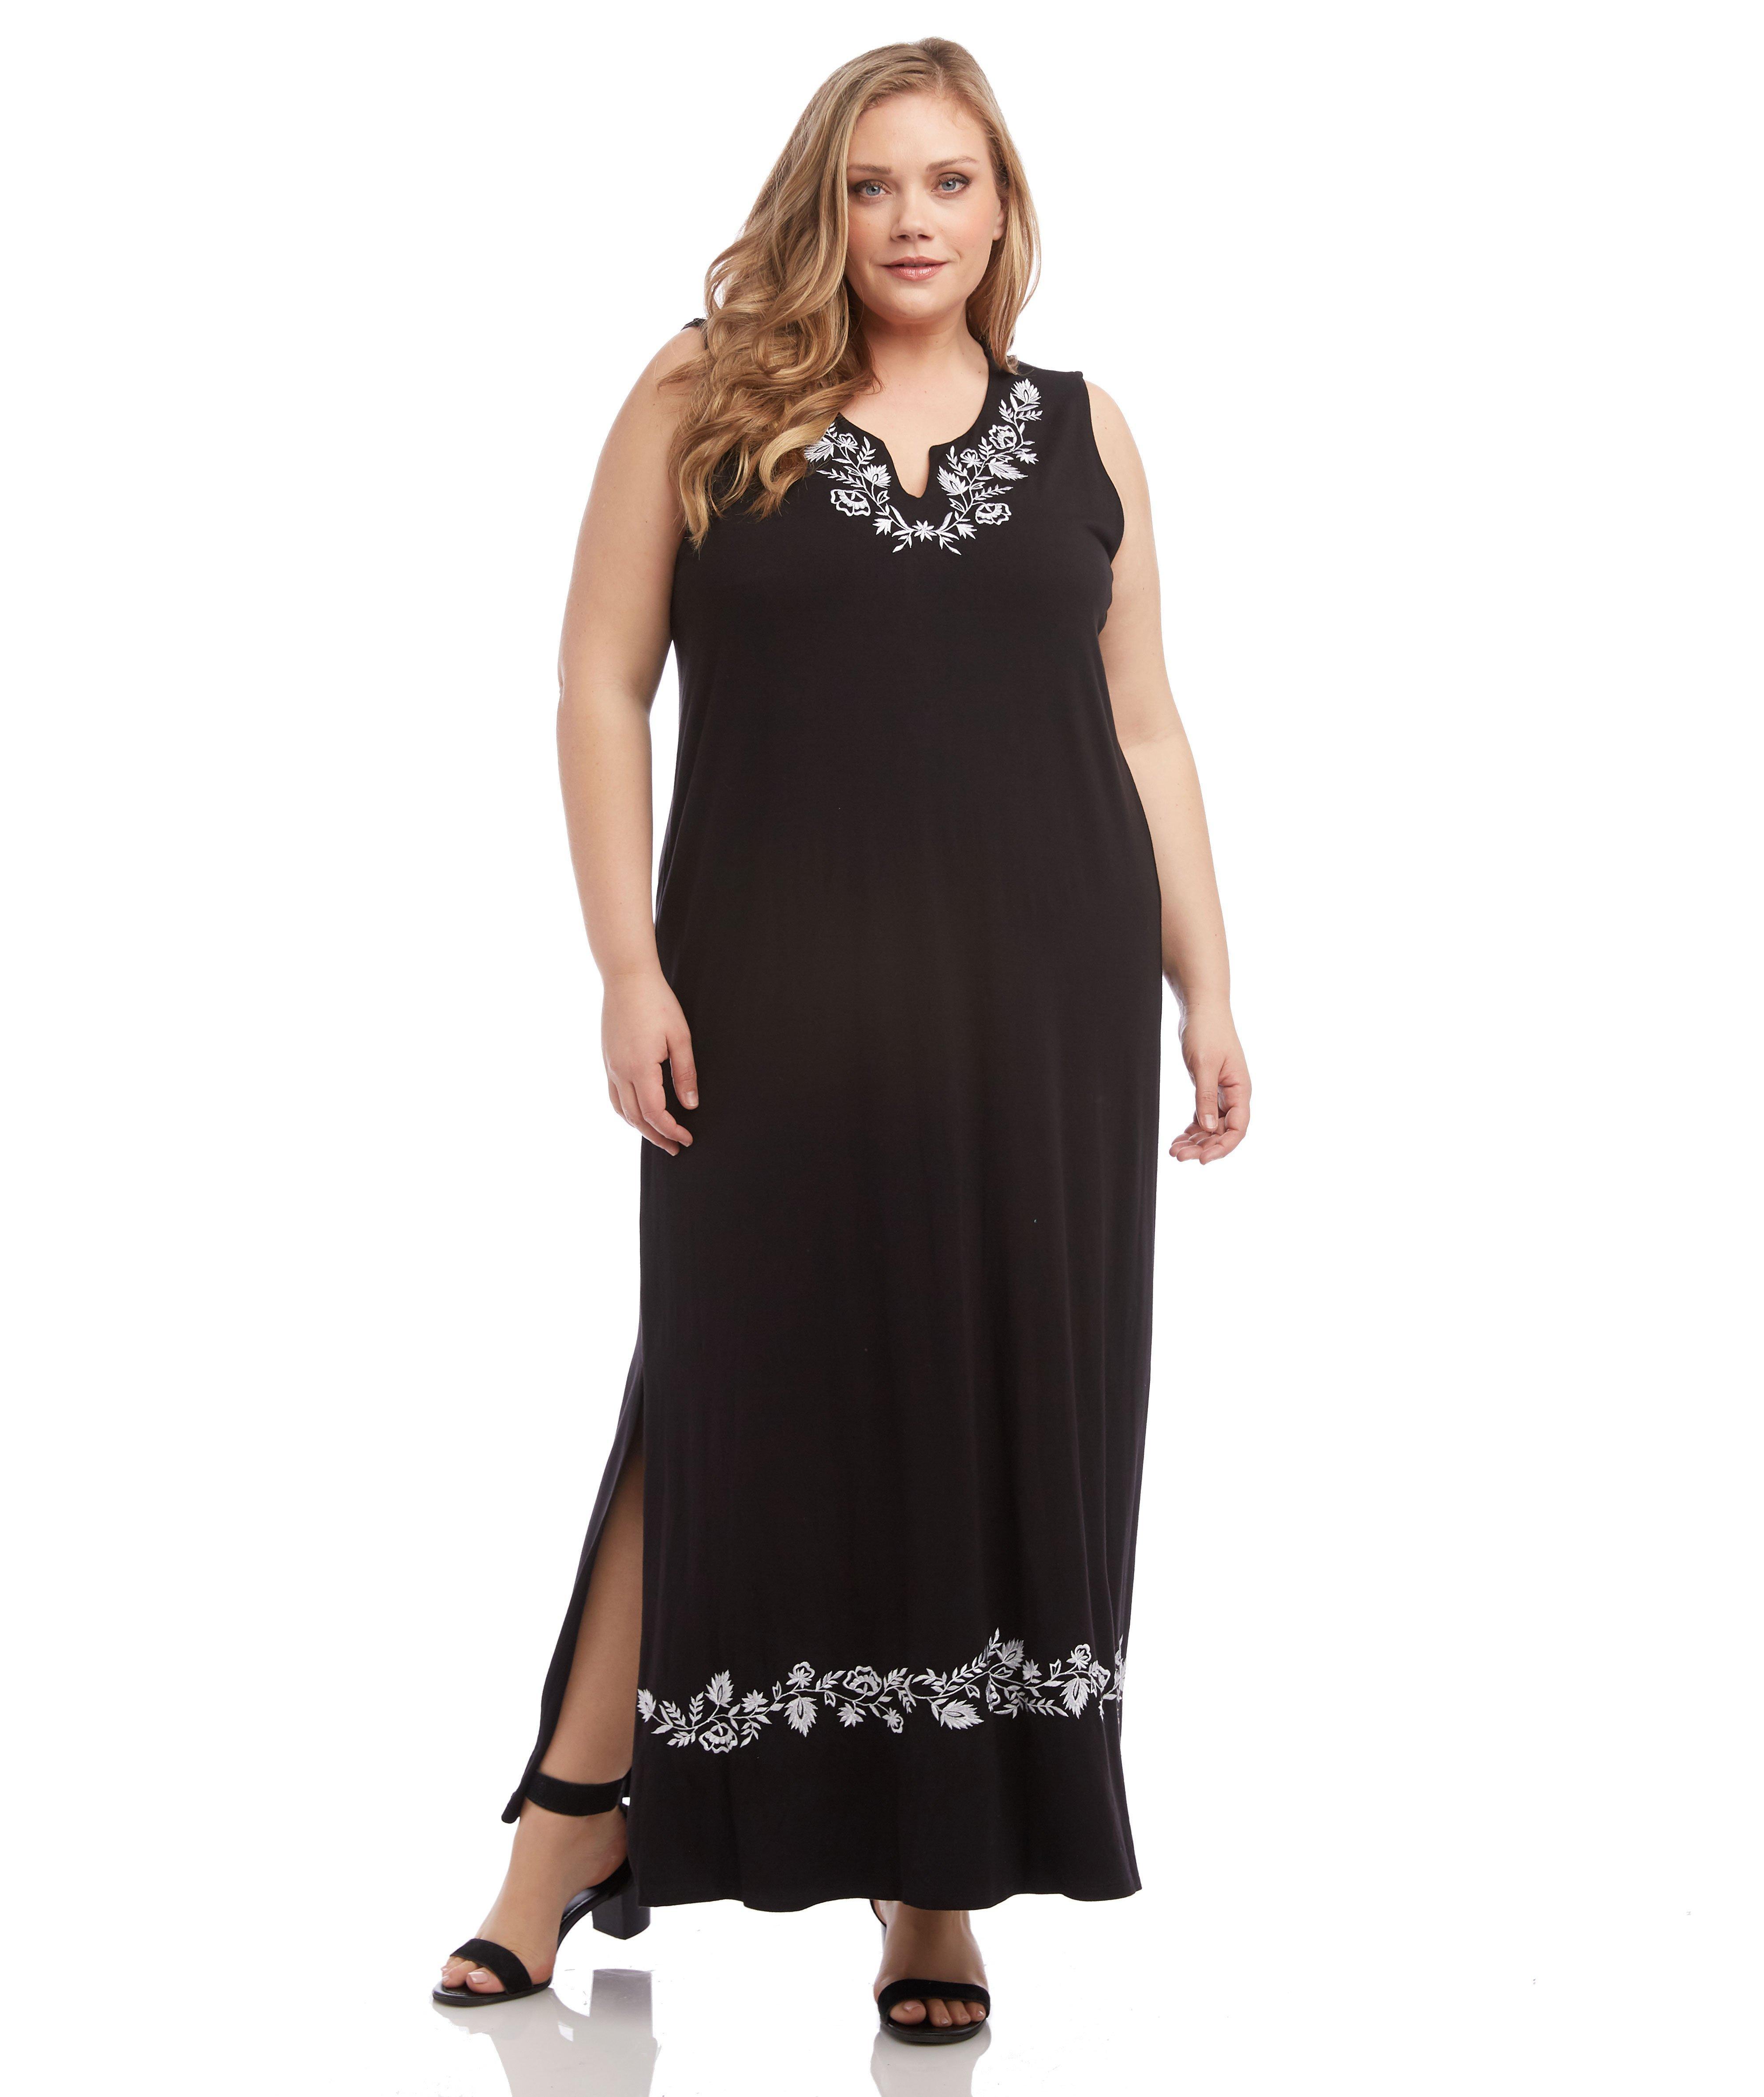 d9889a04b0f Lyst - Karen Kane Embroidered Maxi Dress in Black